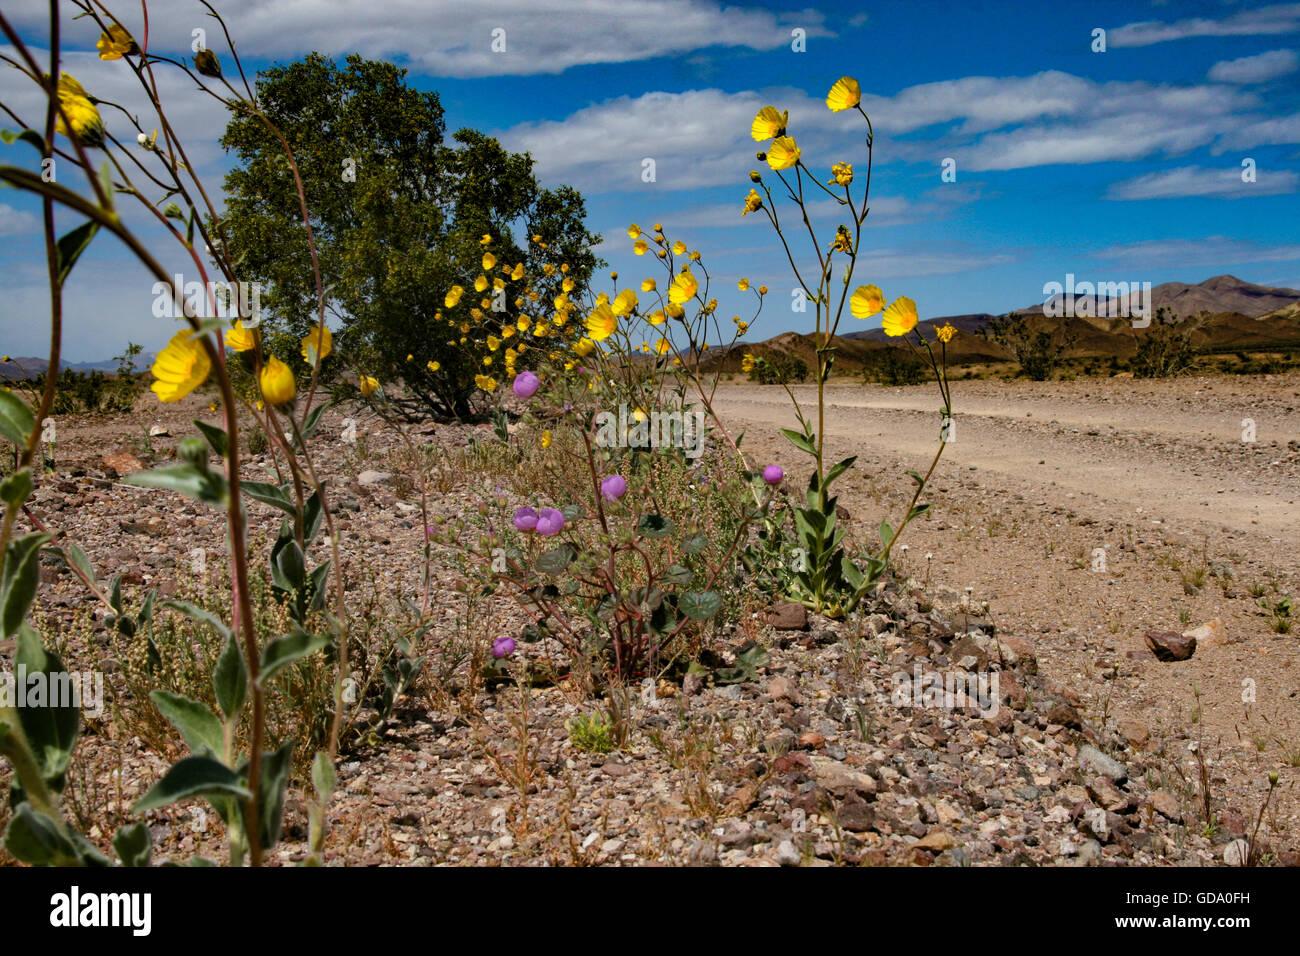 Superbloom Death Valley California - Stock Image